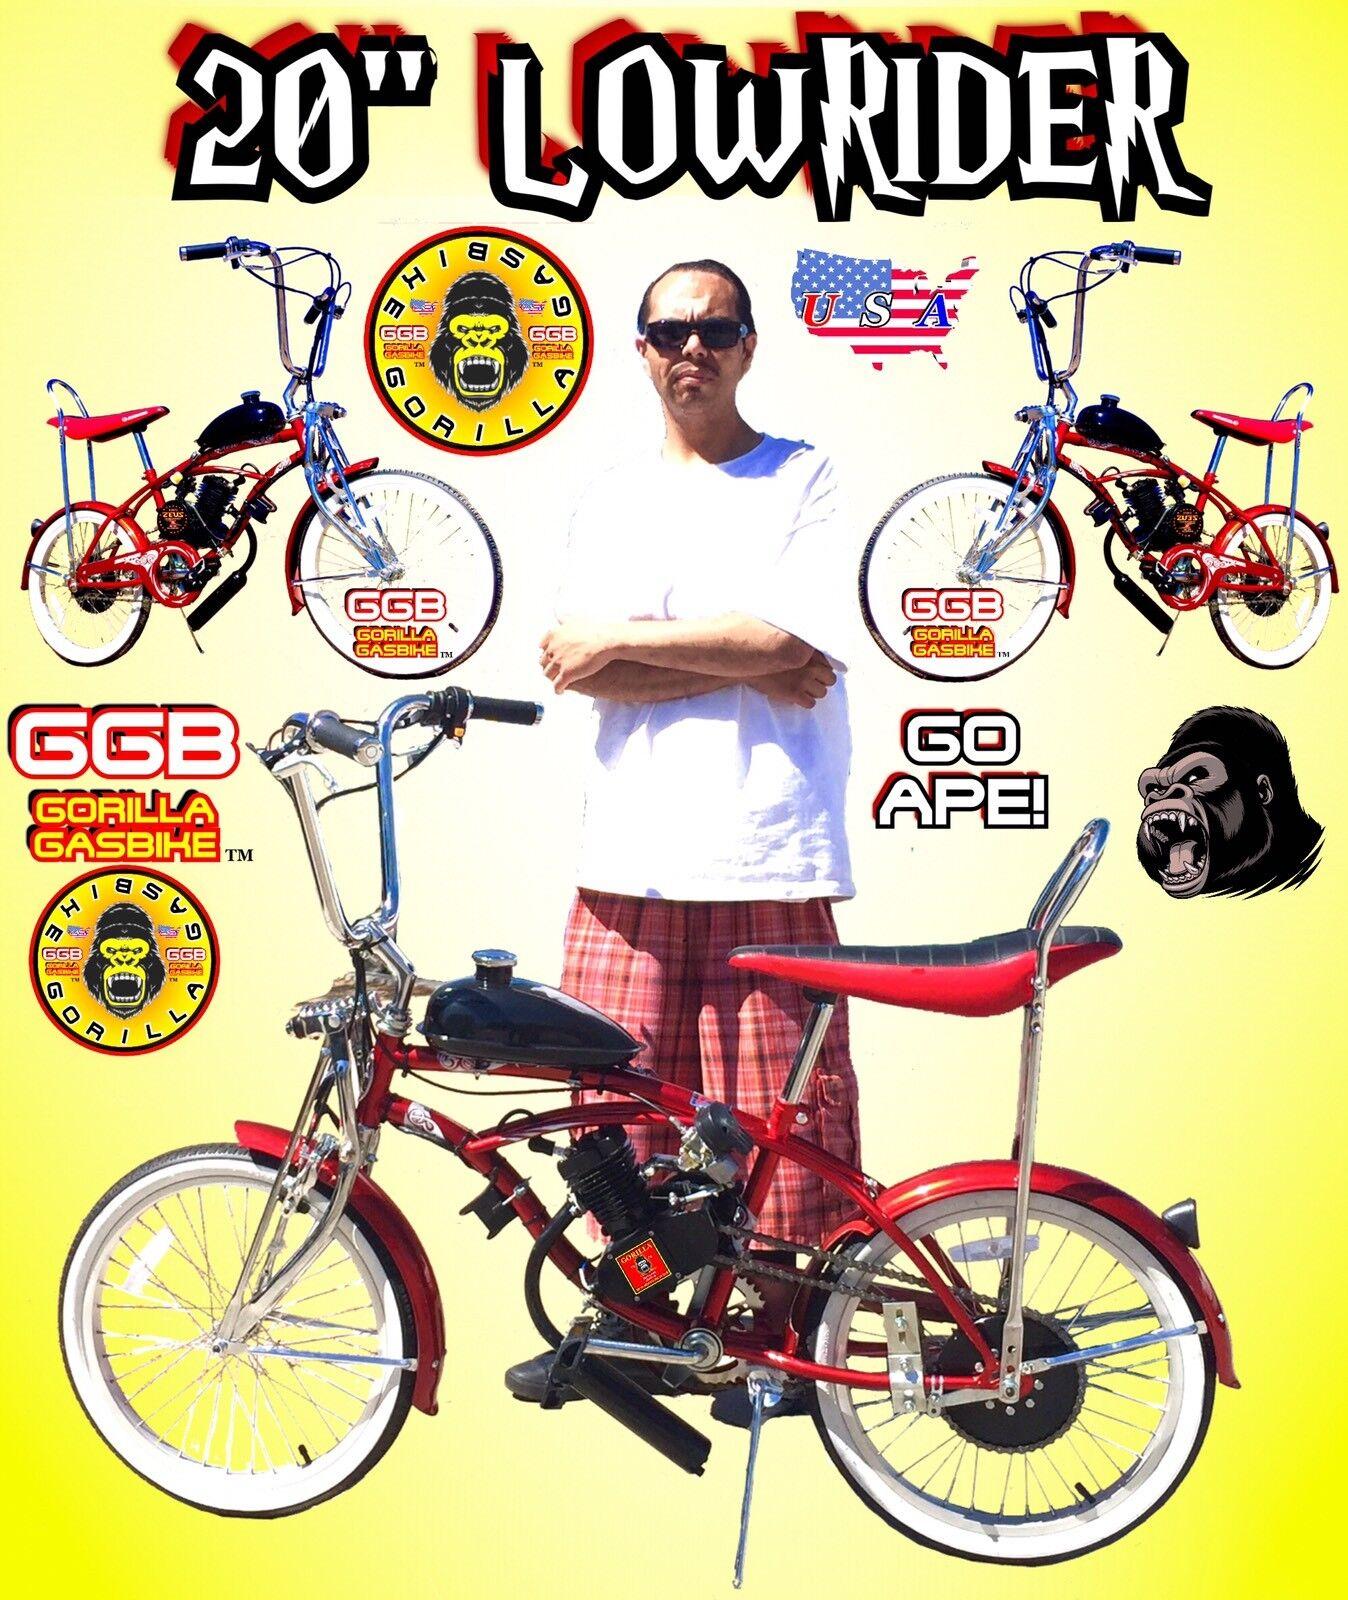 80cc DIY MOTORIZED BIKE KIT AND 20  LOWRIDER BIKE BICYCLE NEW